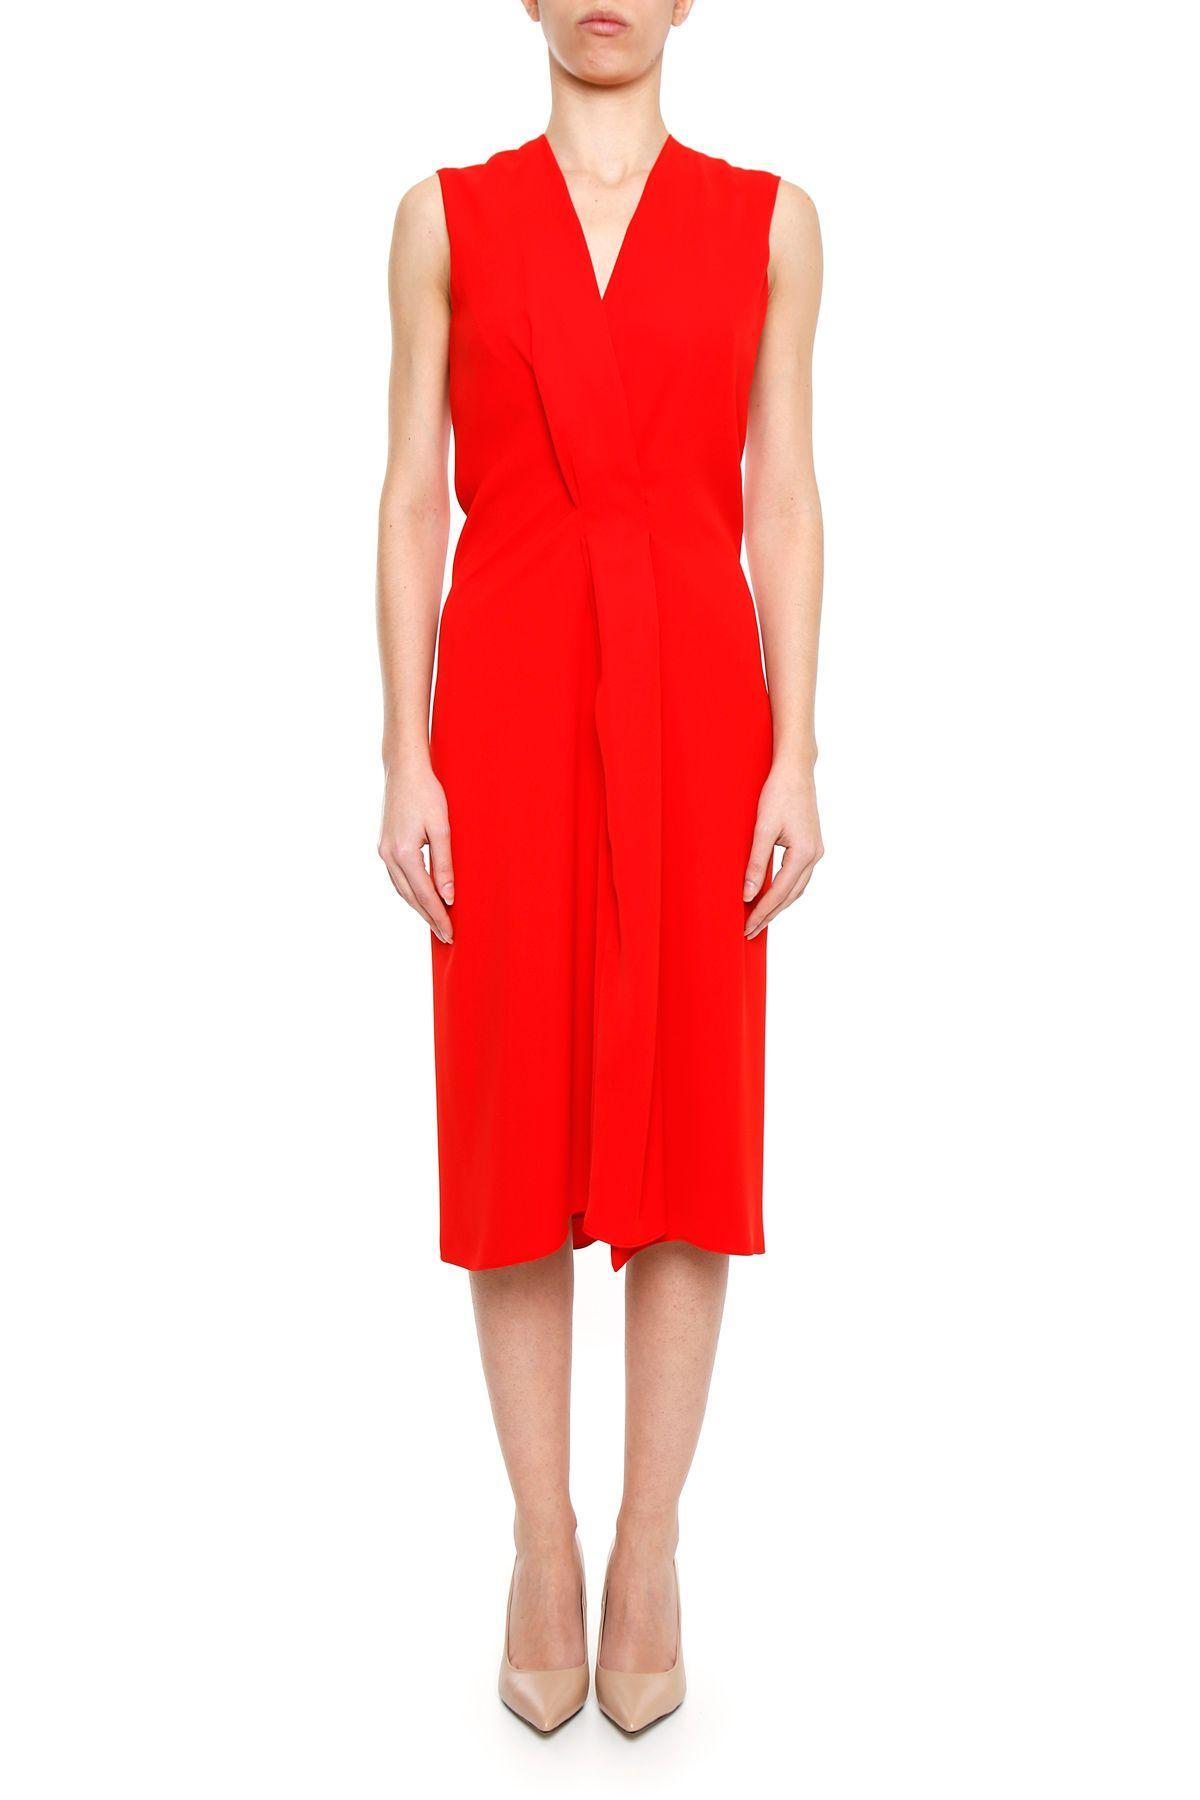 Maison Margiela Dress In Poppy